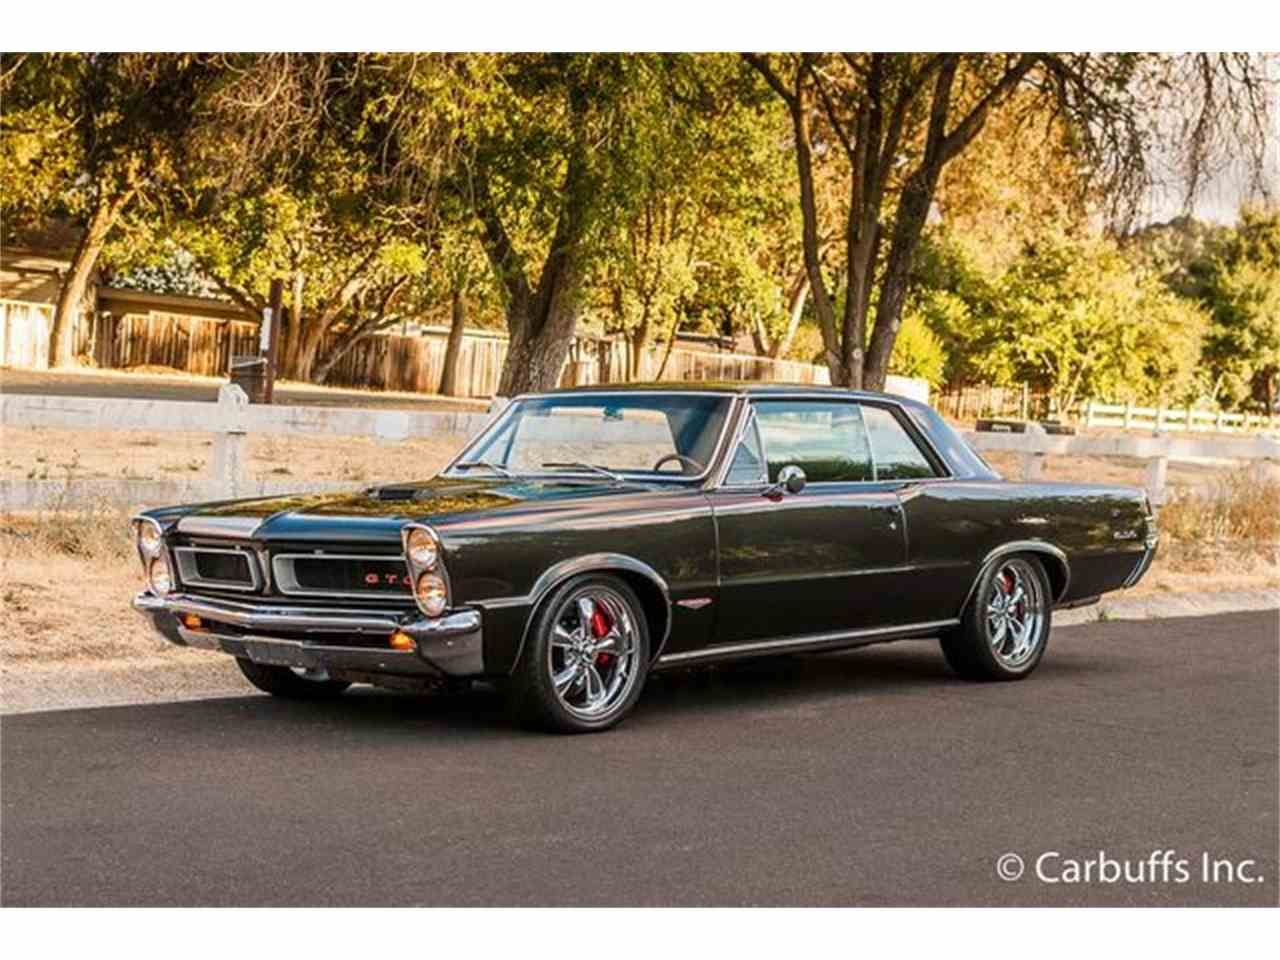 Large Picture of '65 Pontiac GTO located in California - $67,950.00 - LUMM